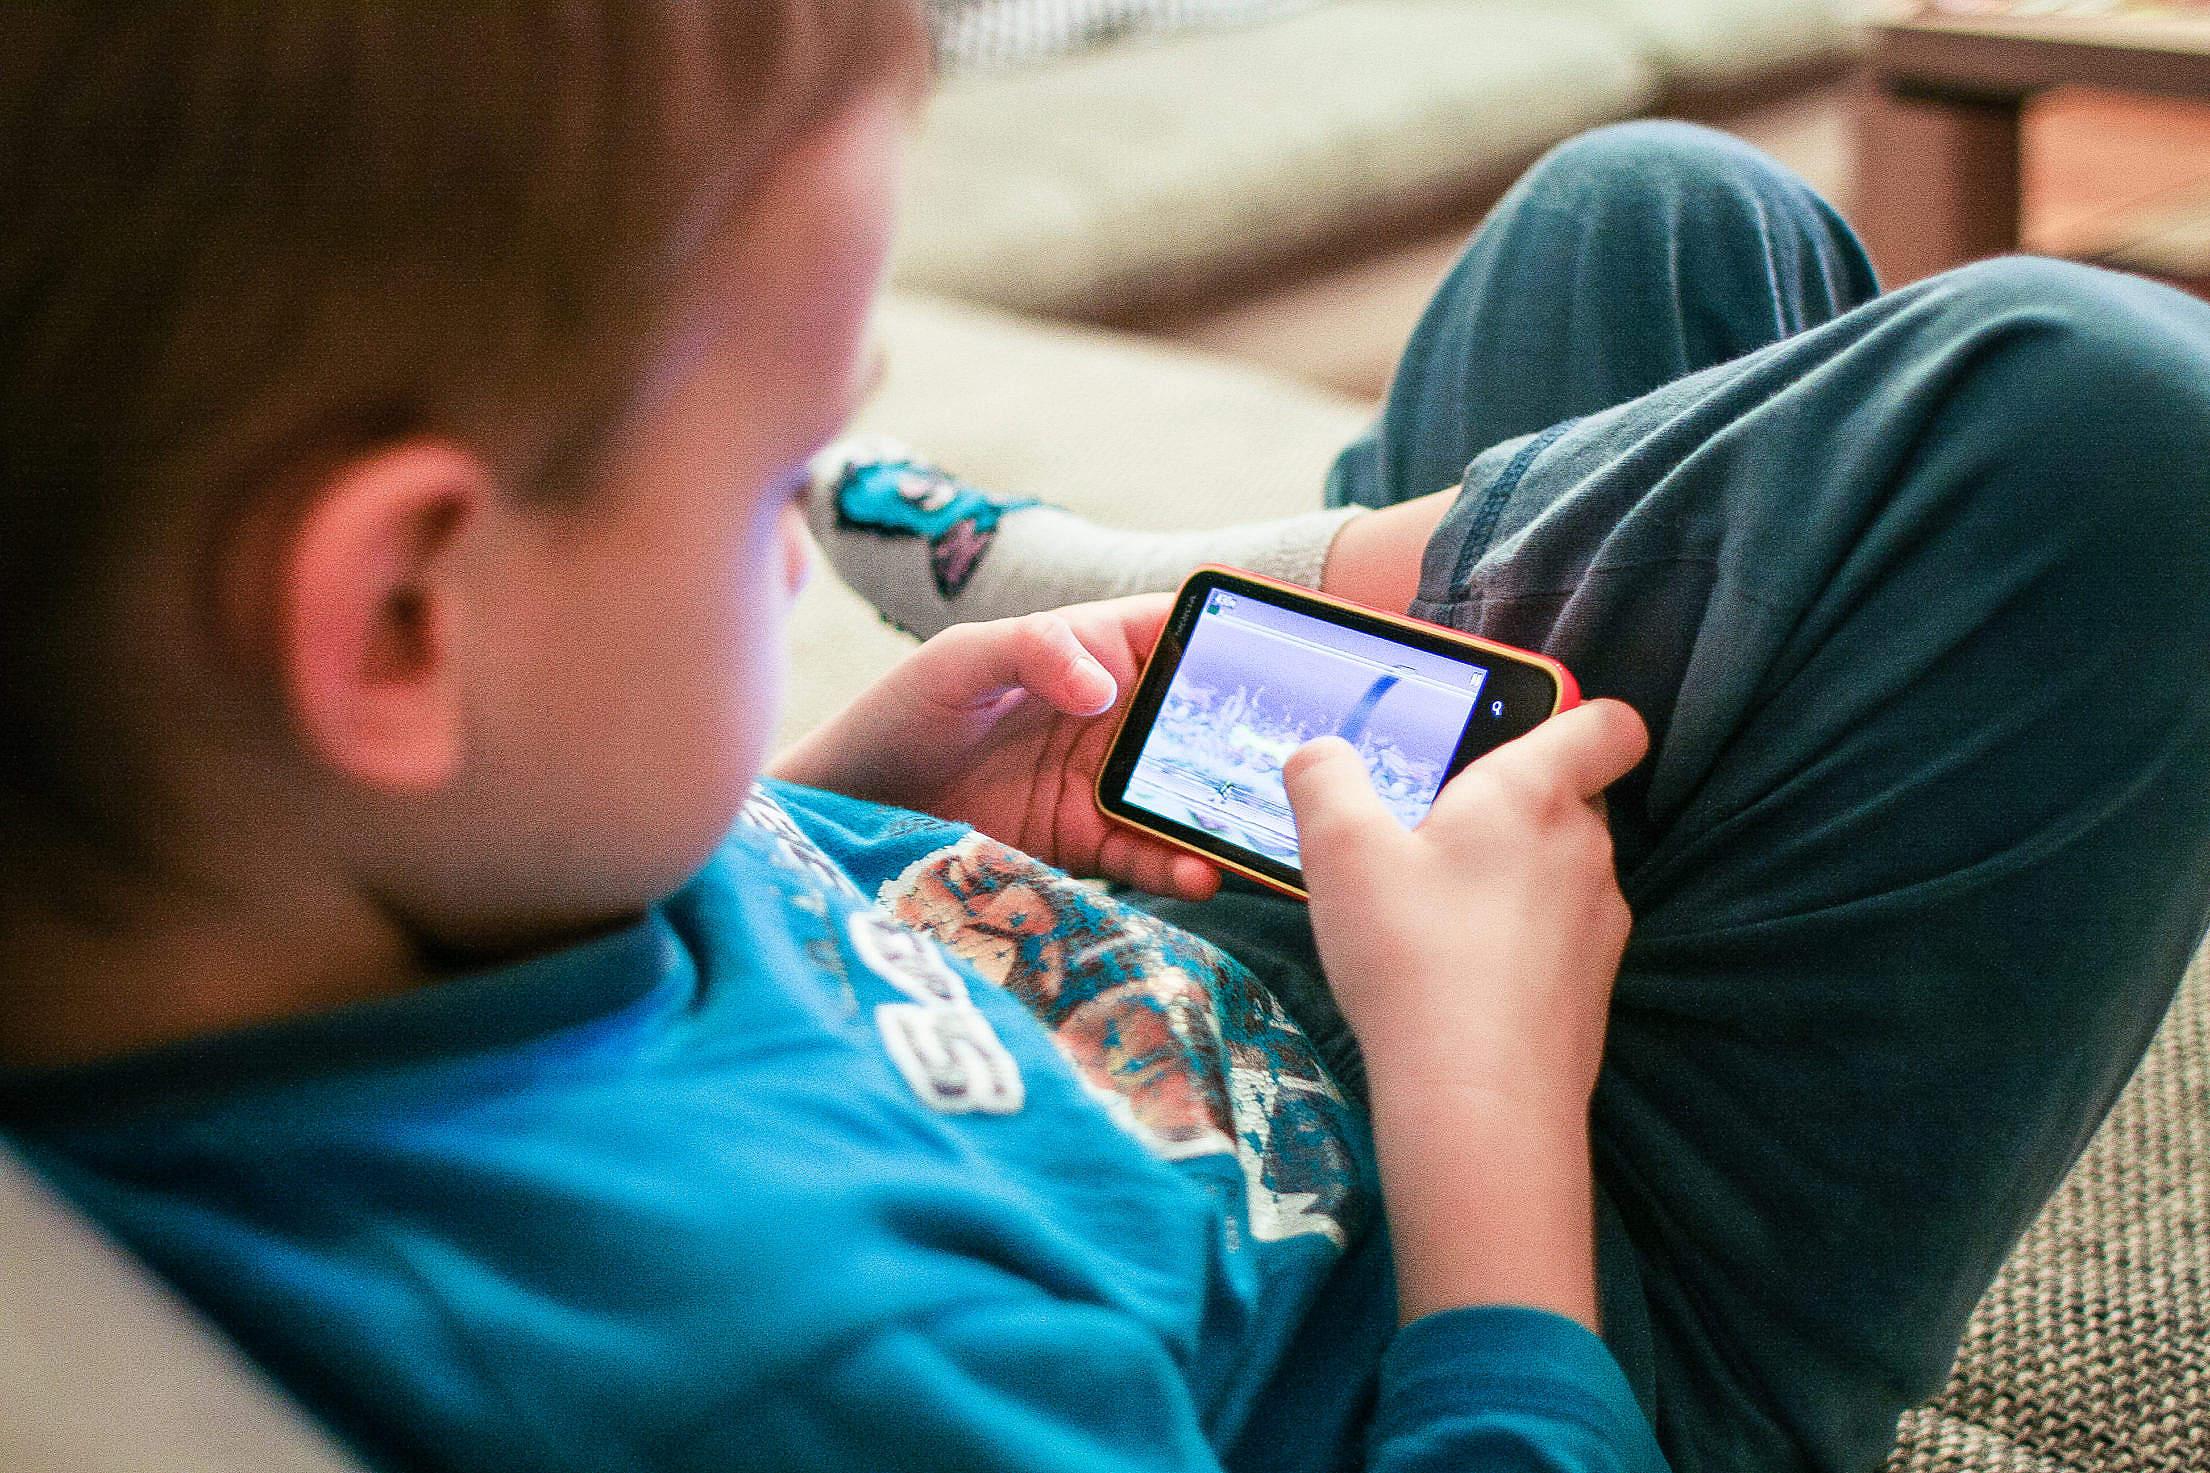 Kids Like Mobile Games Free Stock Photo